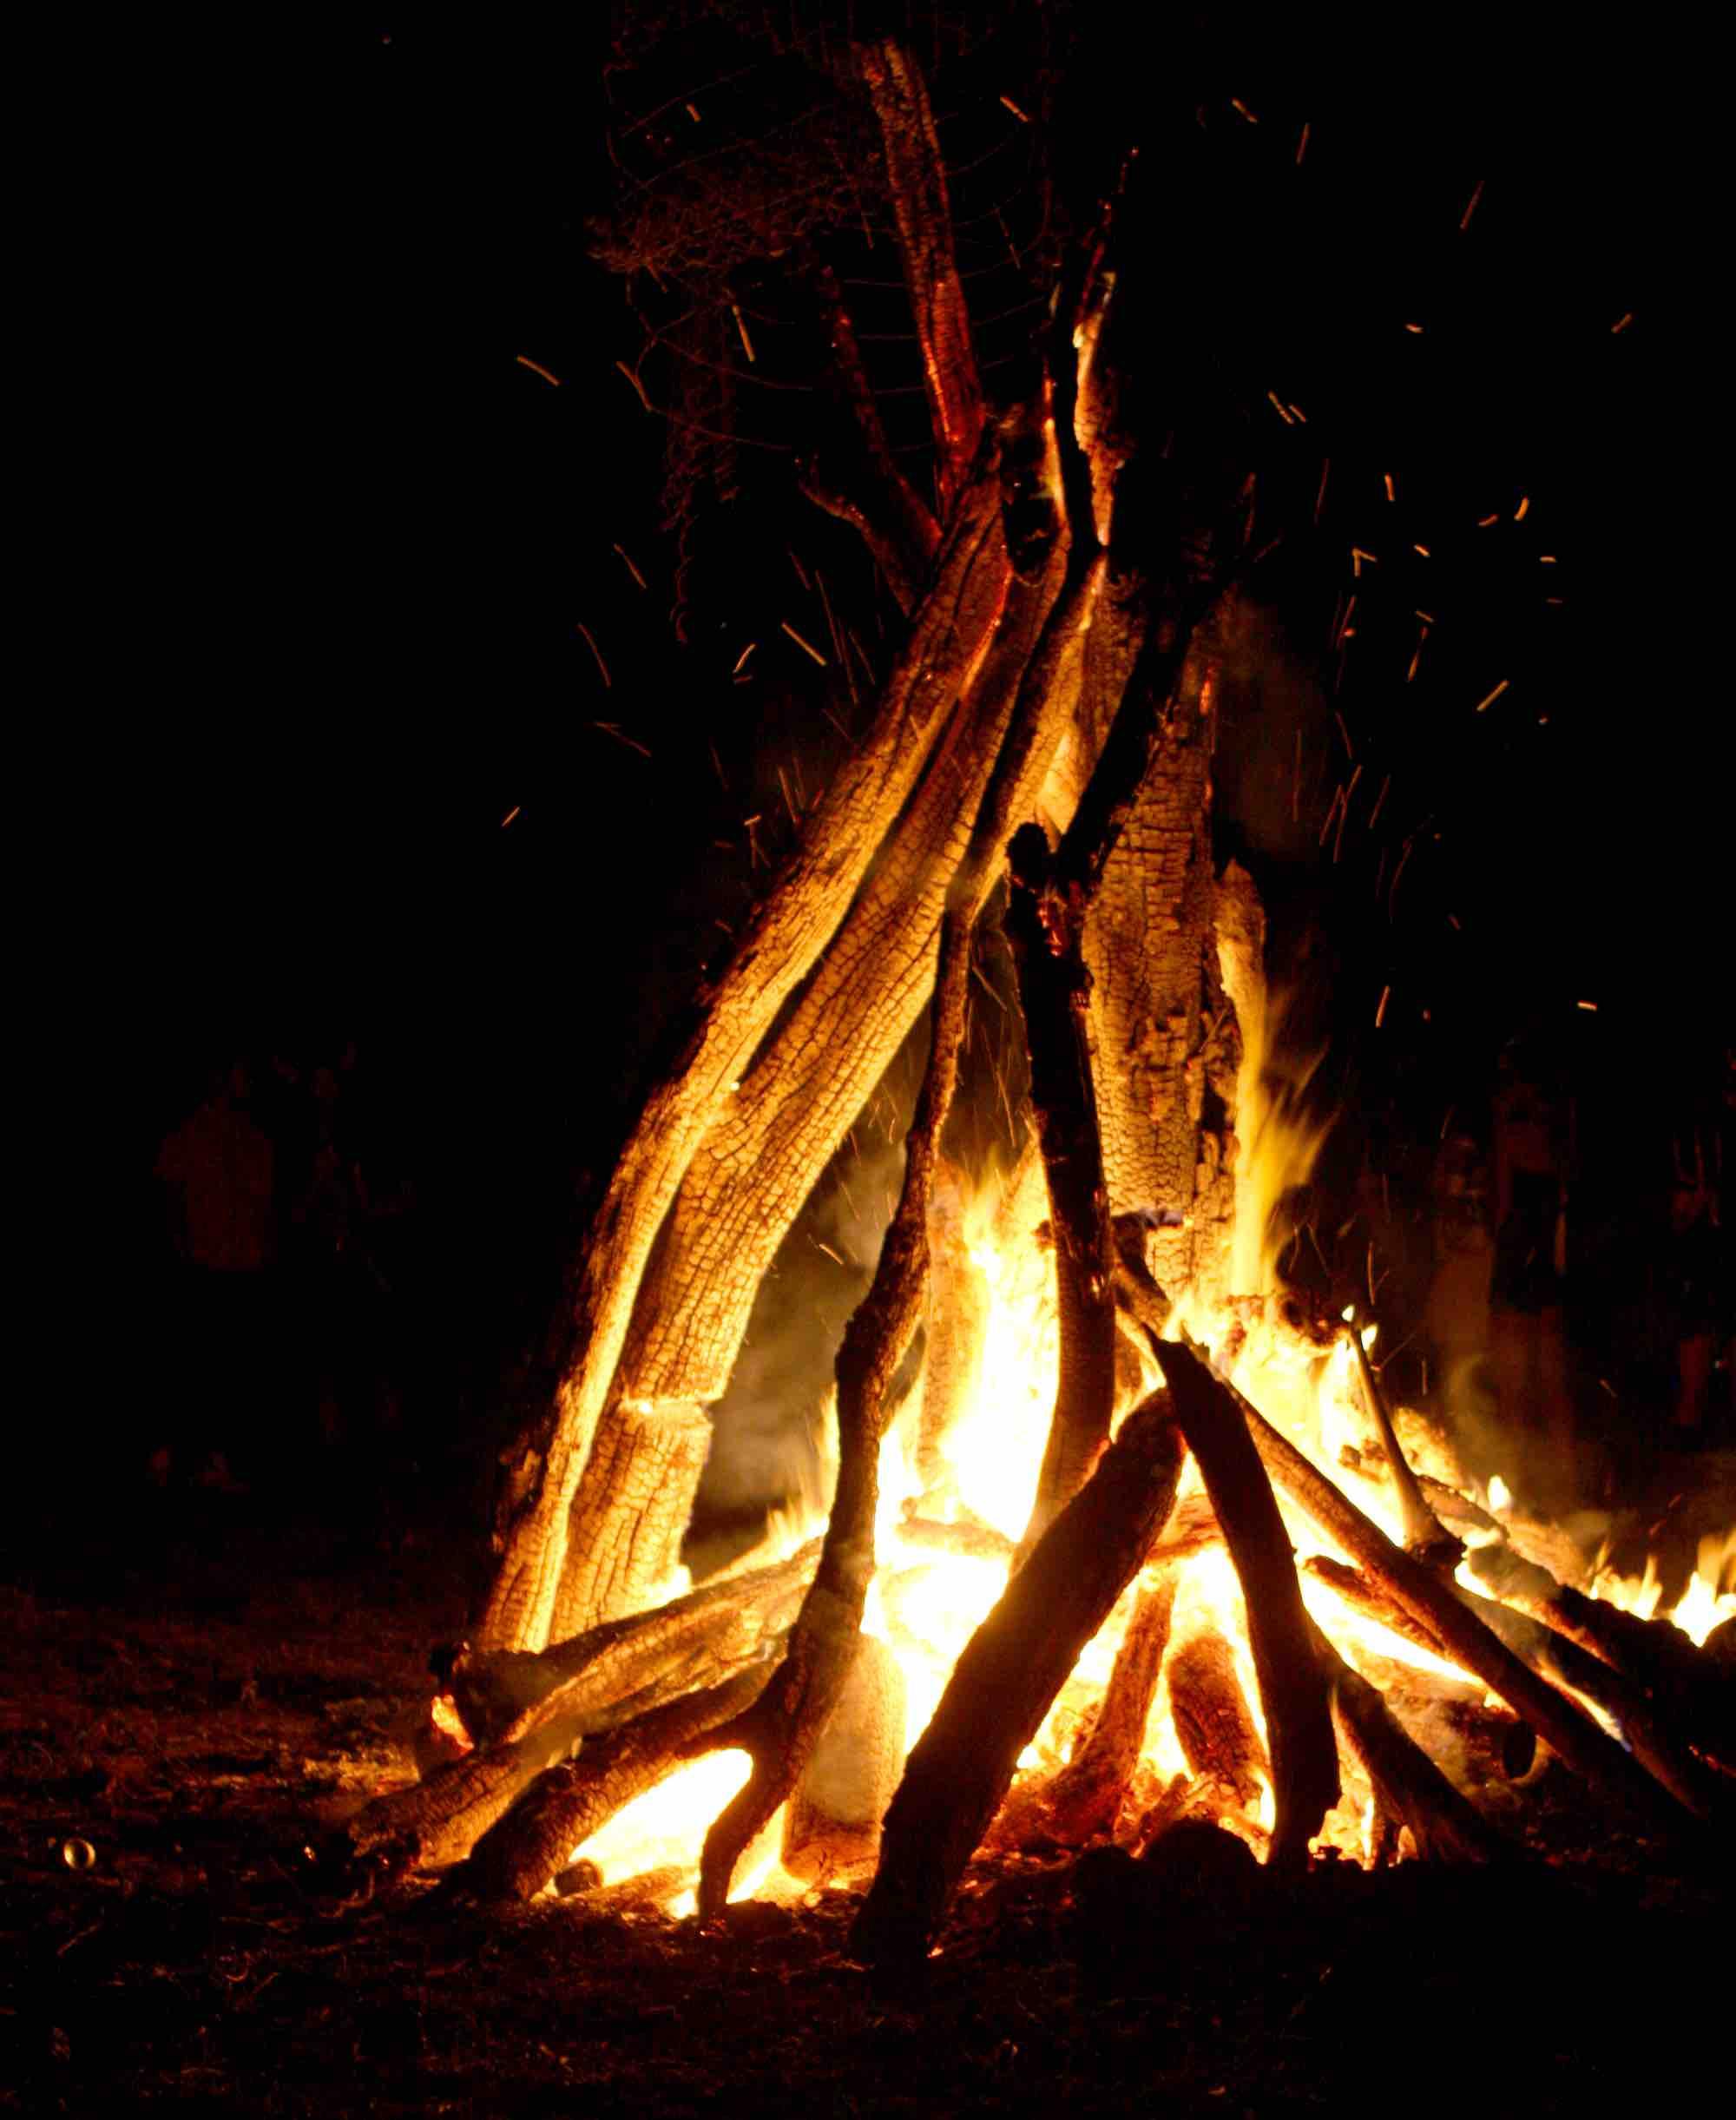 Bonfire-cancelled due to weather - Anoka Halloween